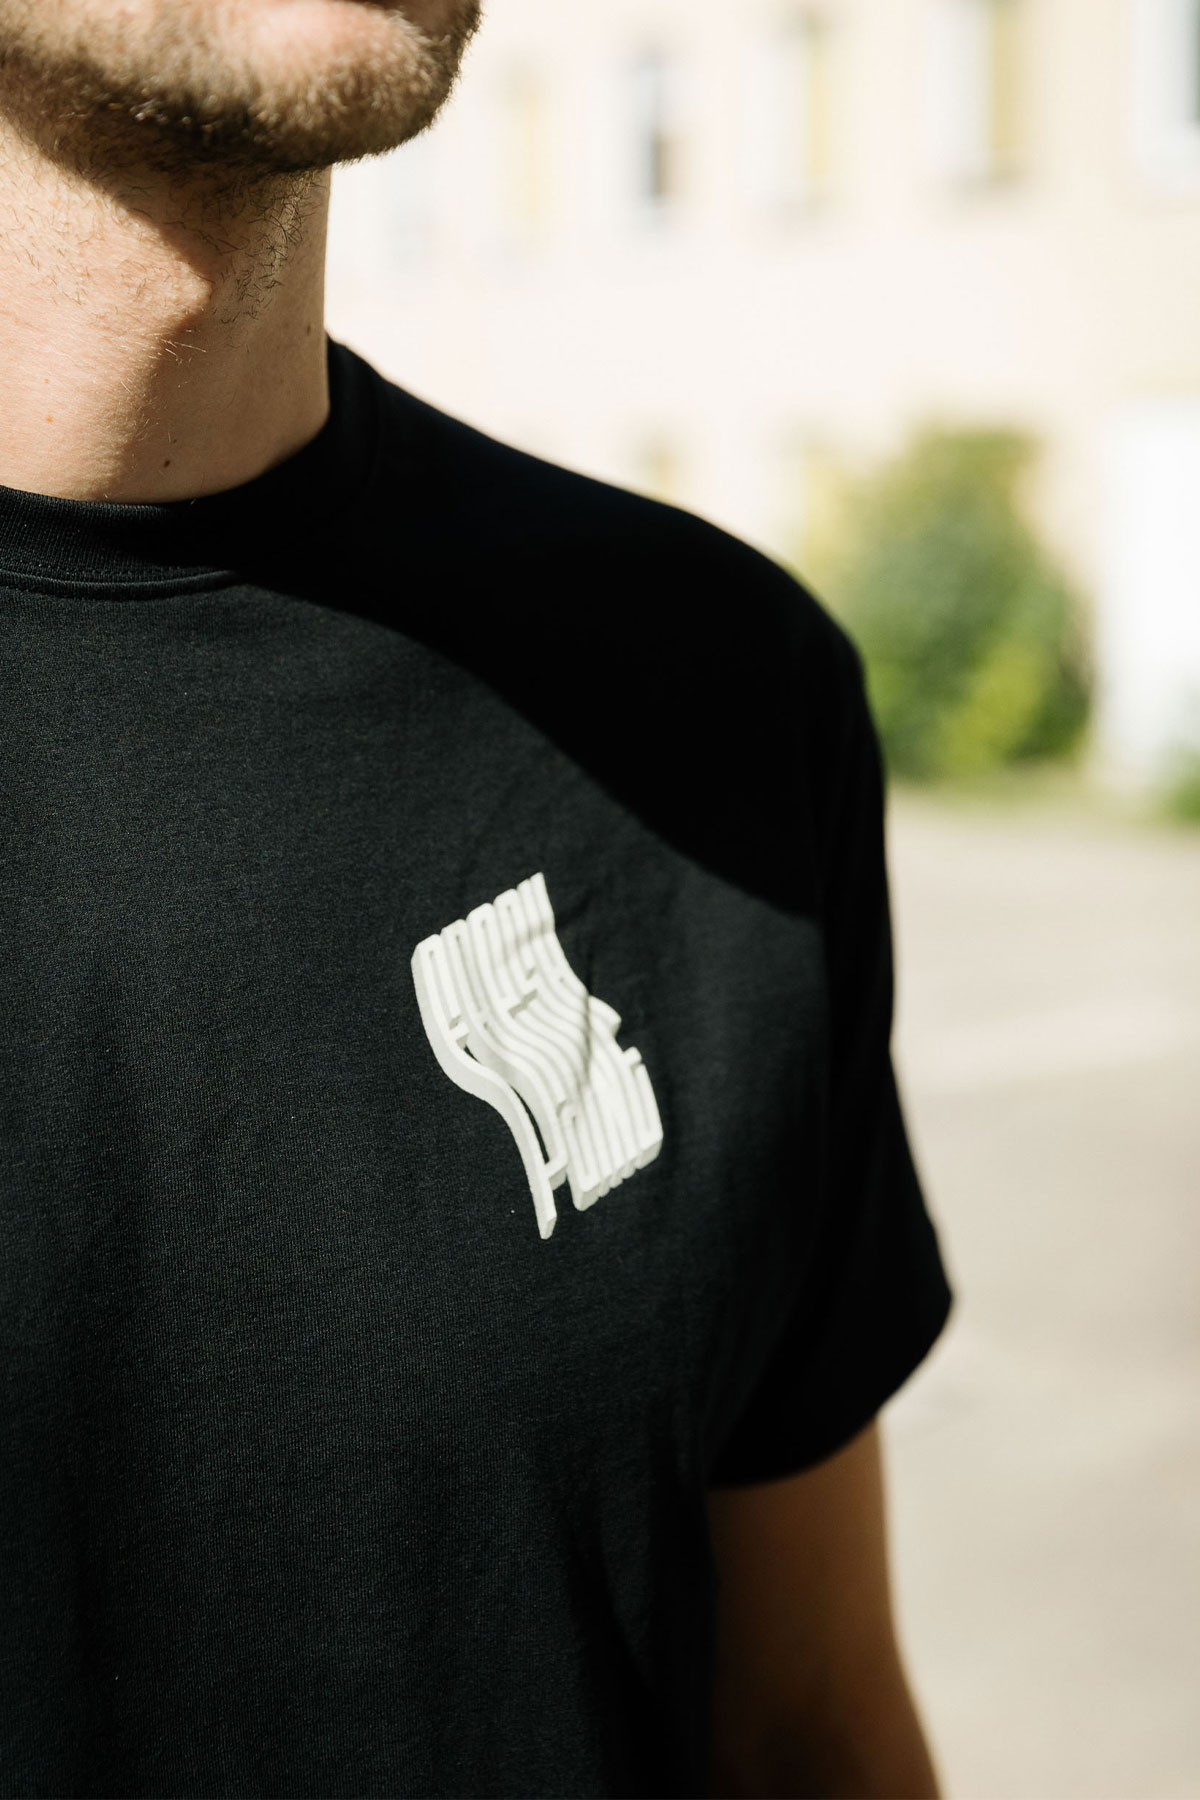 Montana FRESH PAINT 3D Black T-Shirt by Prefid